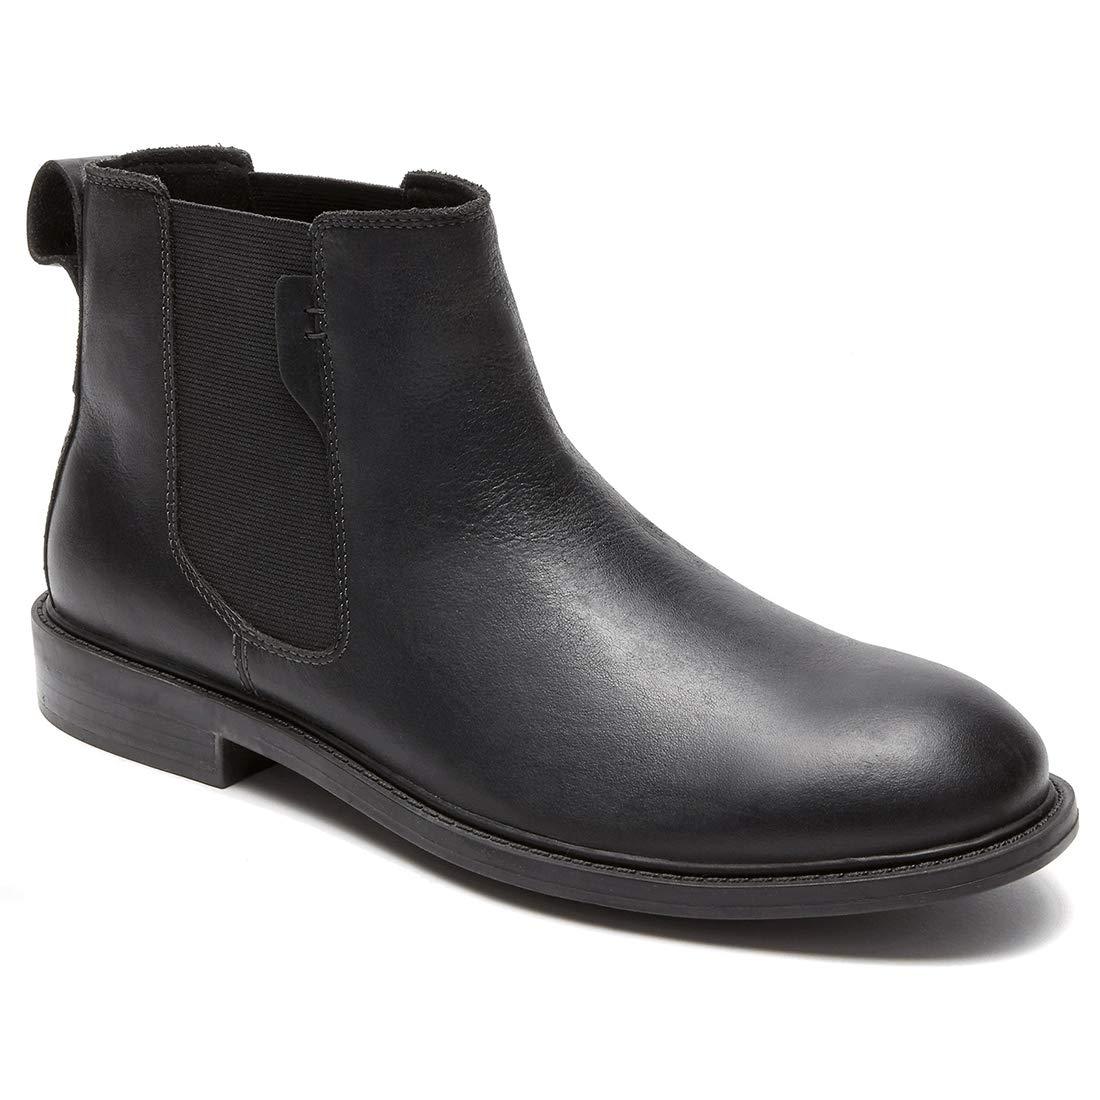 Dunham Men's Graham-Dun Chelsea Boot, Black, 10.5 D US